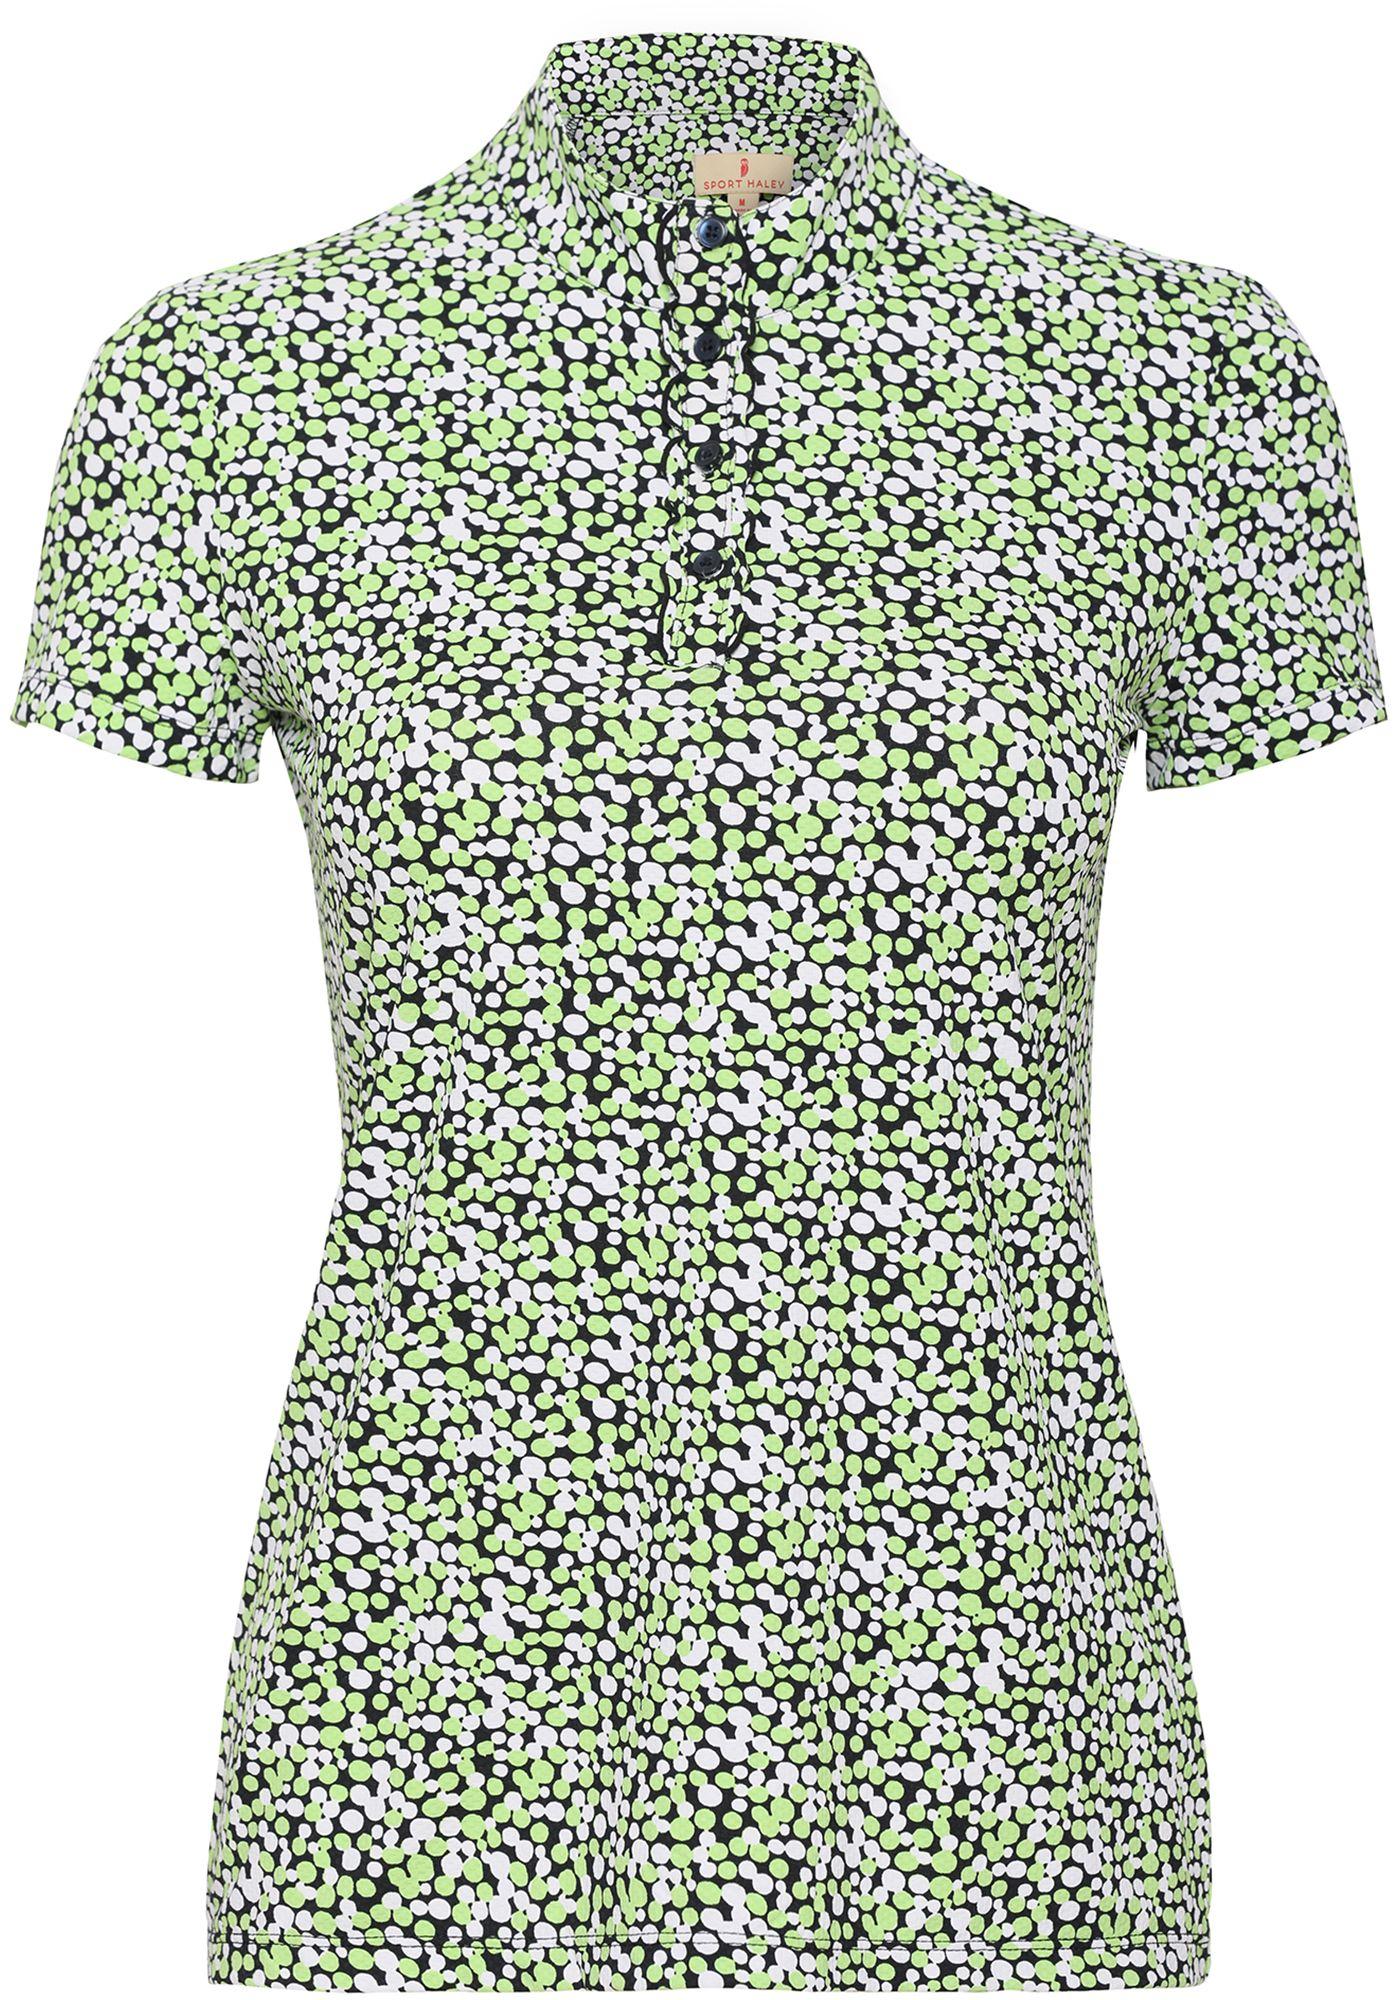 Sport Haley Women's Dottie Short Sleeve Print Golf Polo